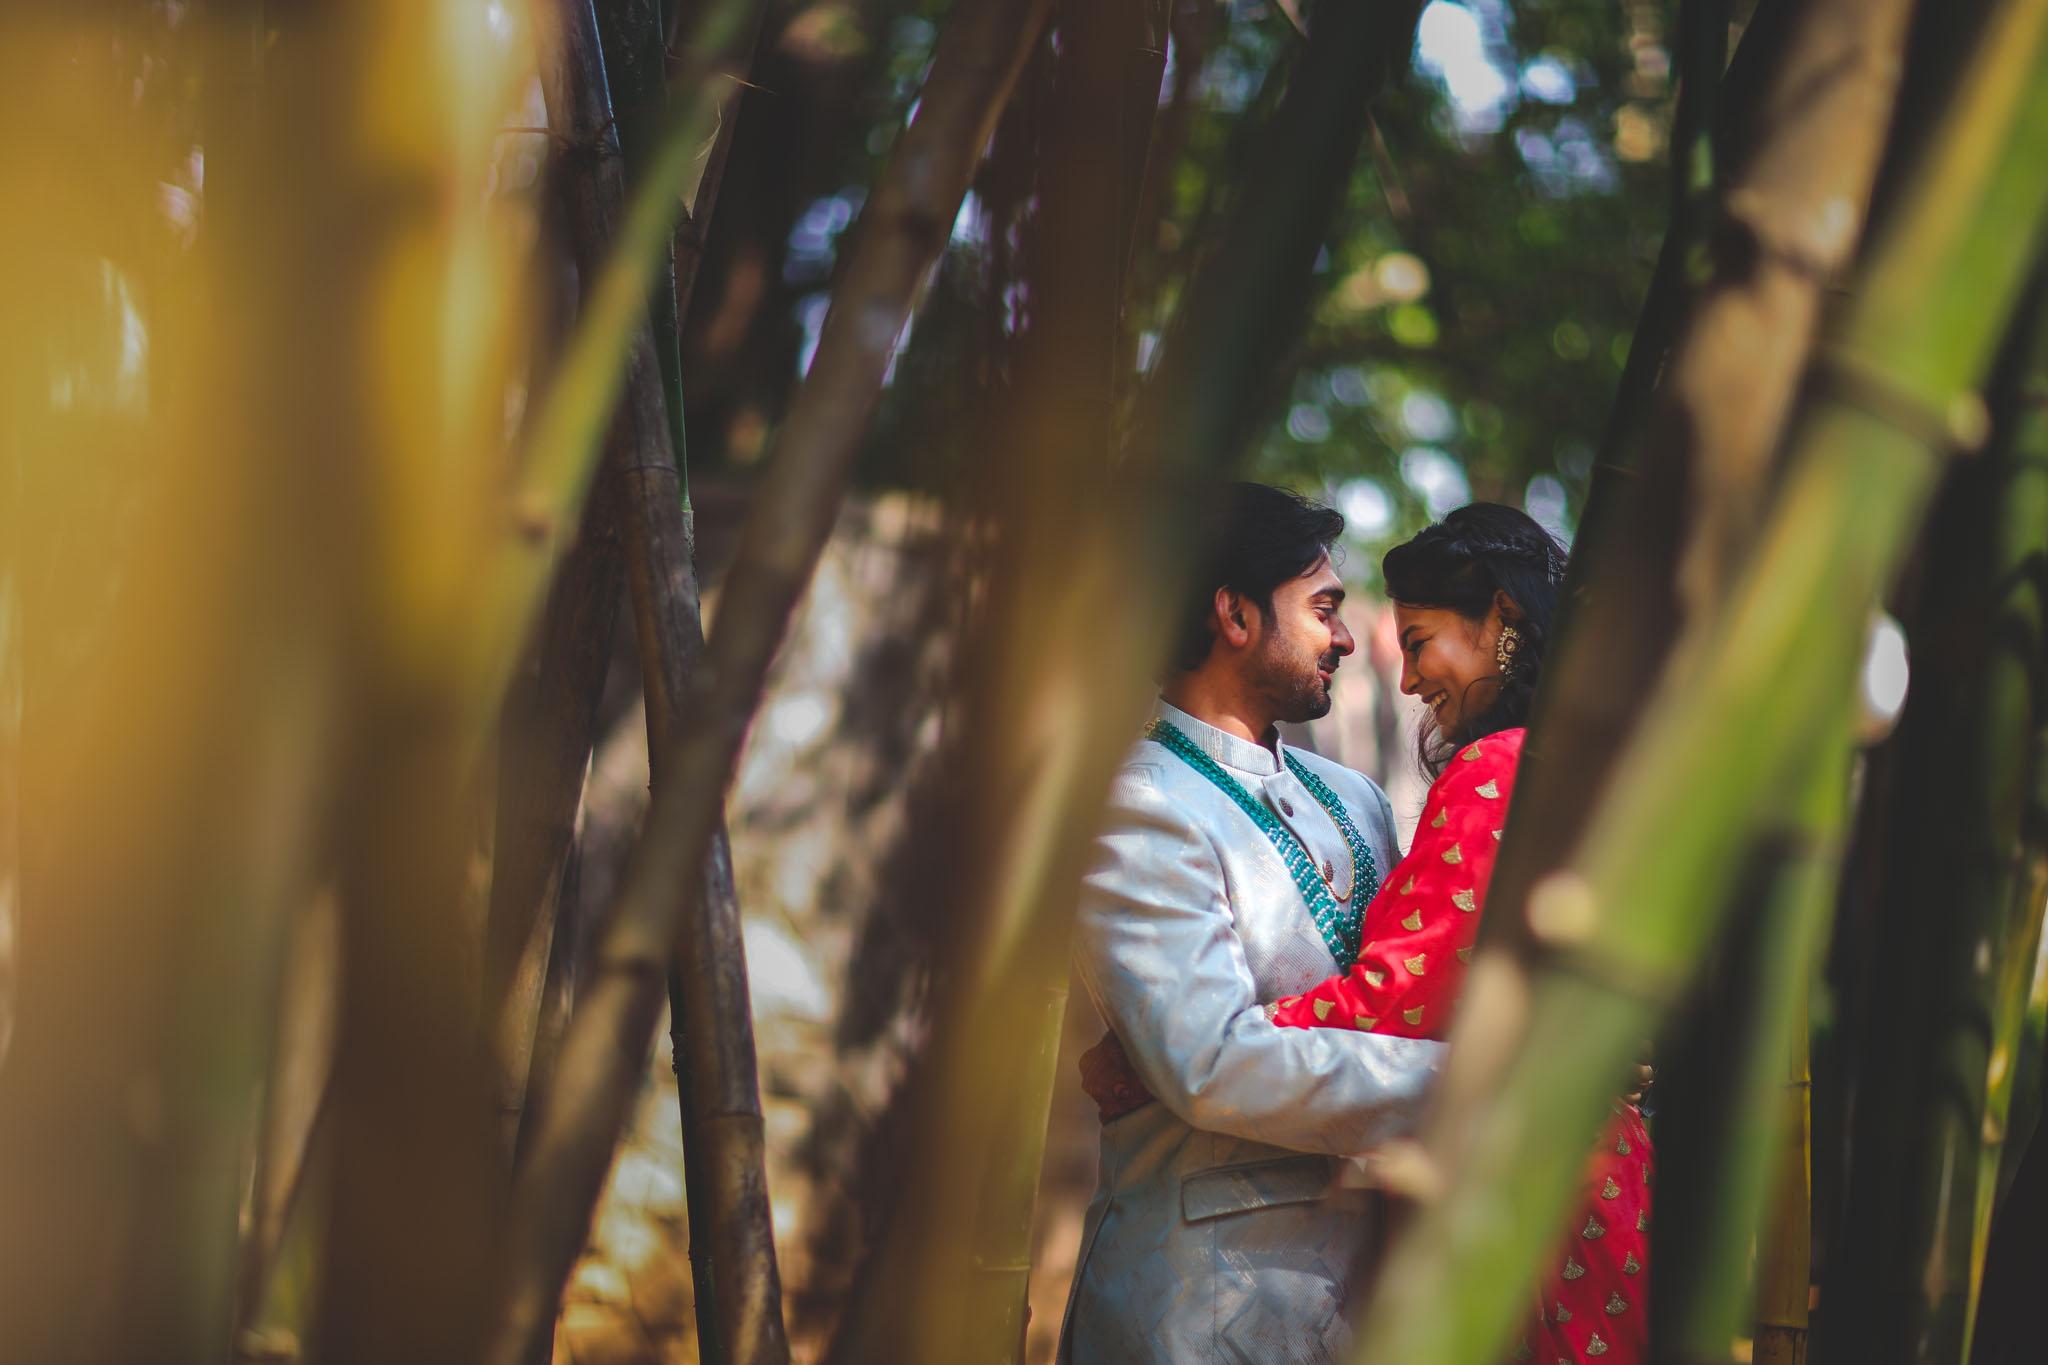 Mukti x Ojas Wedding Akshjay Sansare Photography Best wedding photographer in mumbai India Candid Cinematic Films videos-4.jpg